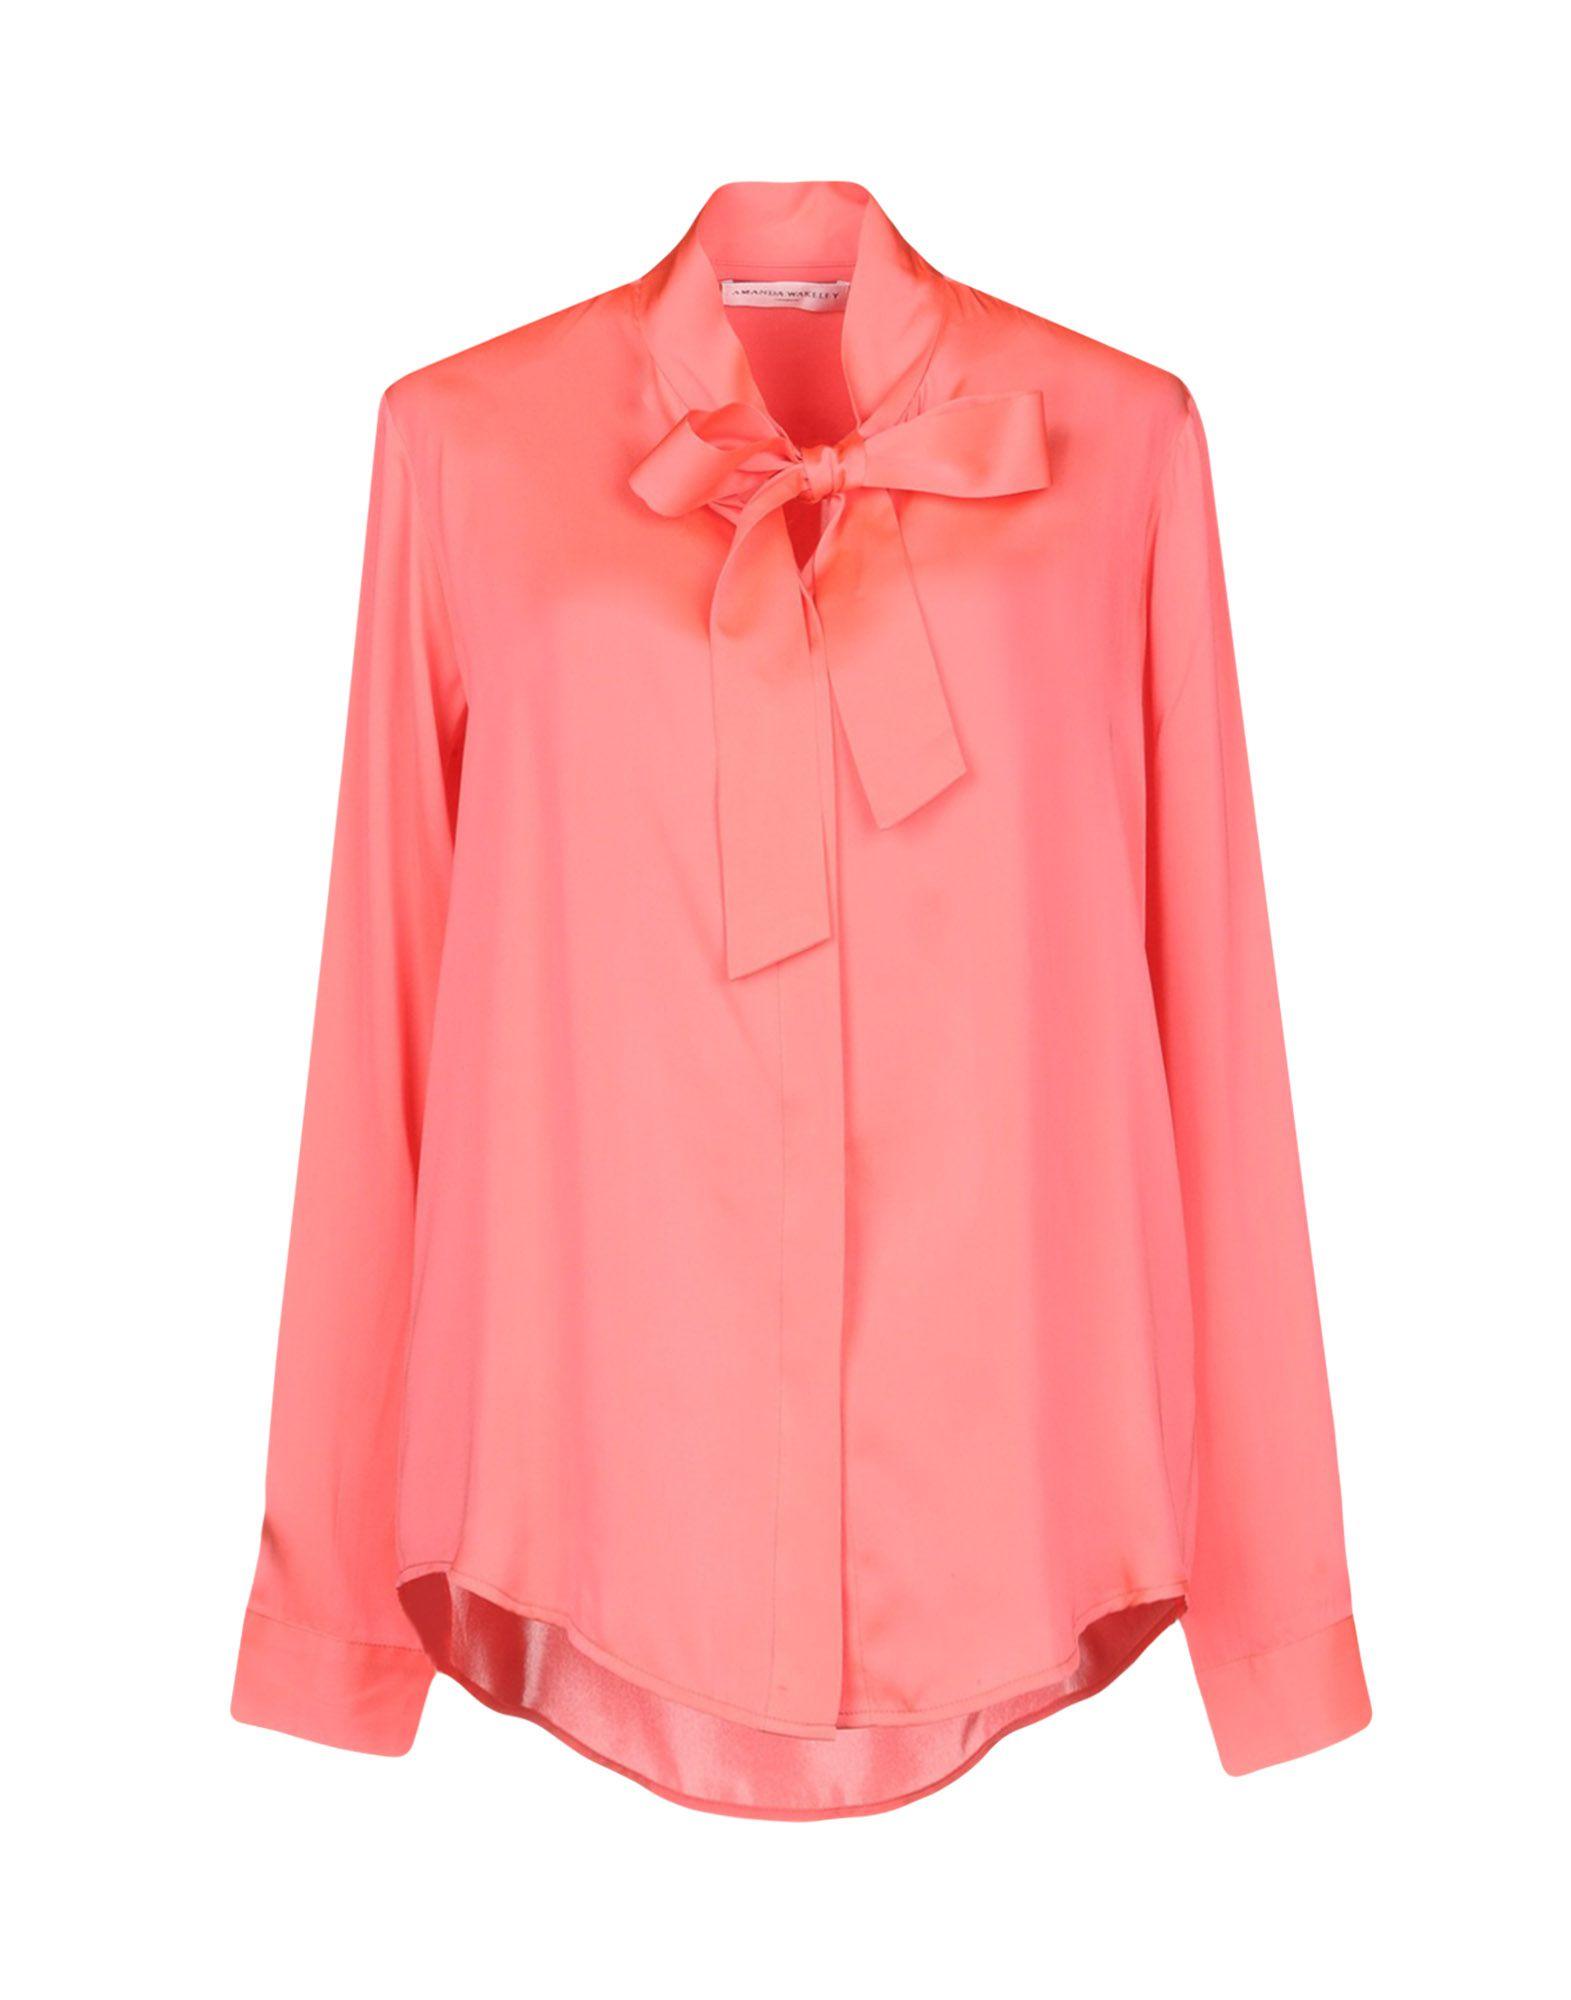 Amanda Wakeley Shirts & blouses with bow